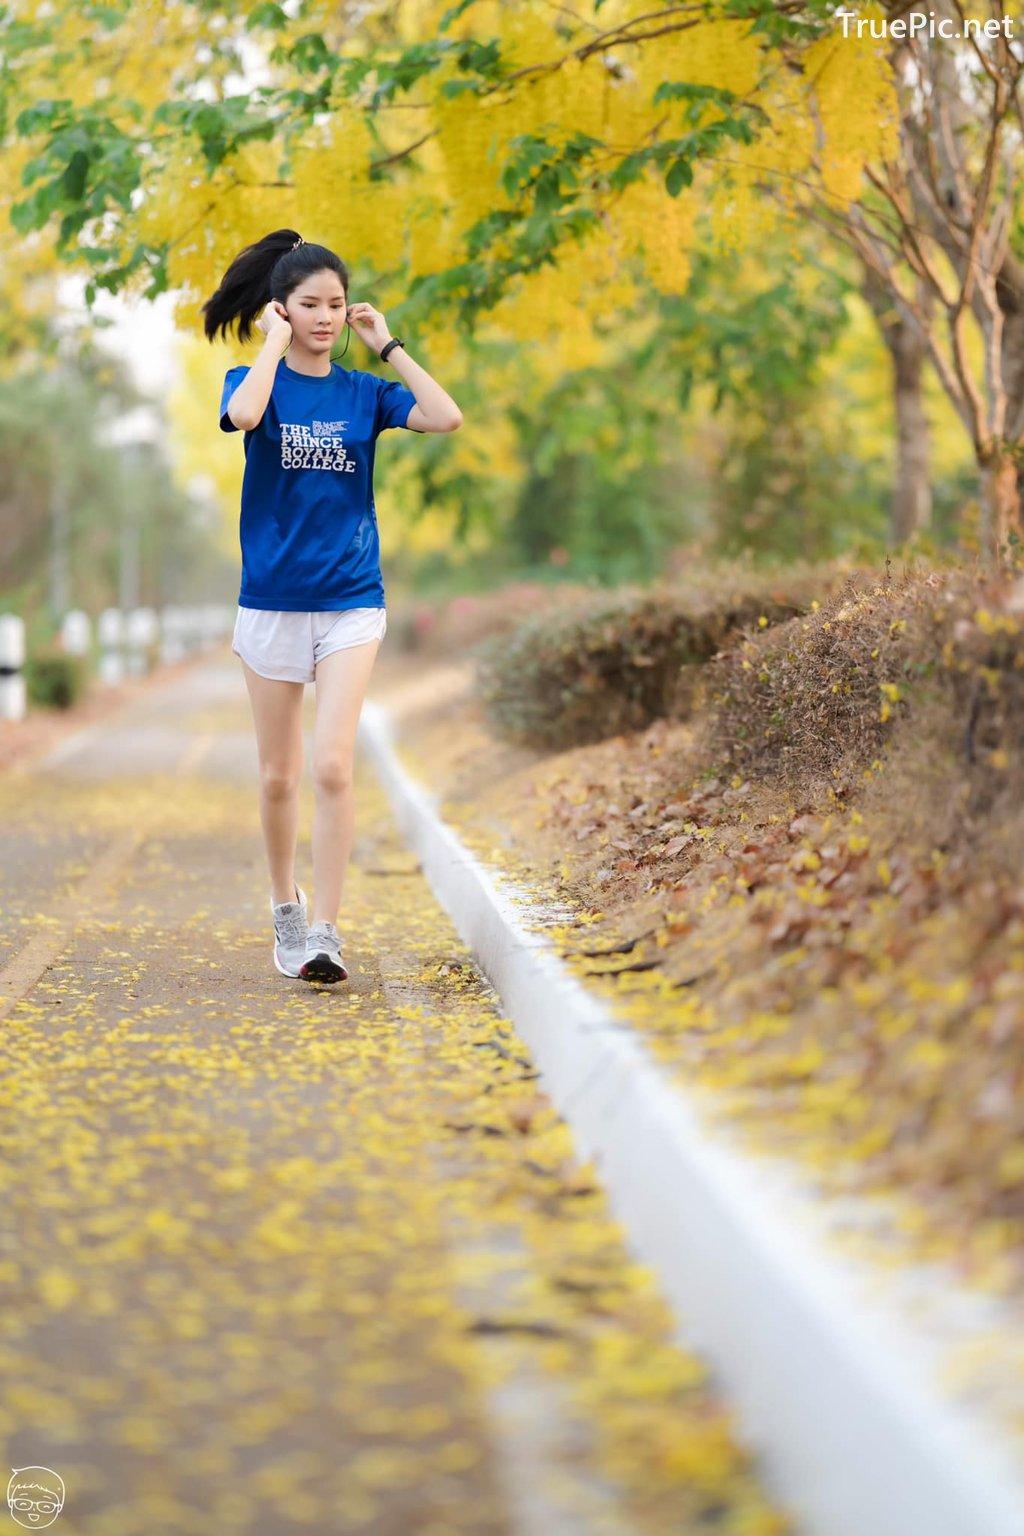 Image Thailand Model - Nuttacha Chayangkanont - Fun & Run - TruePic.net - Picture-6